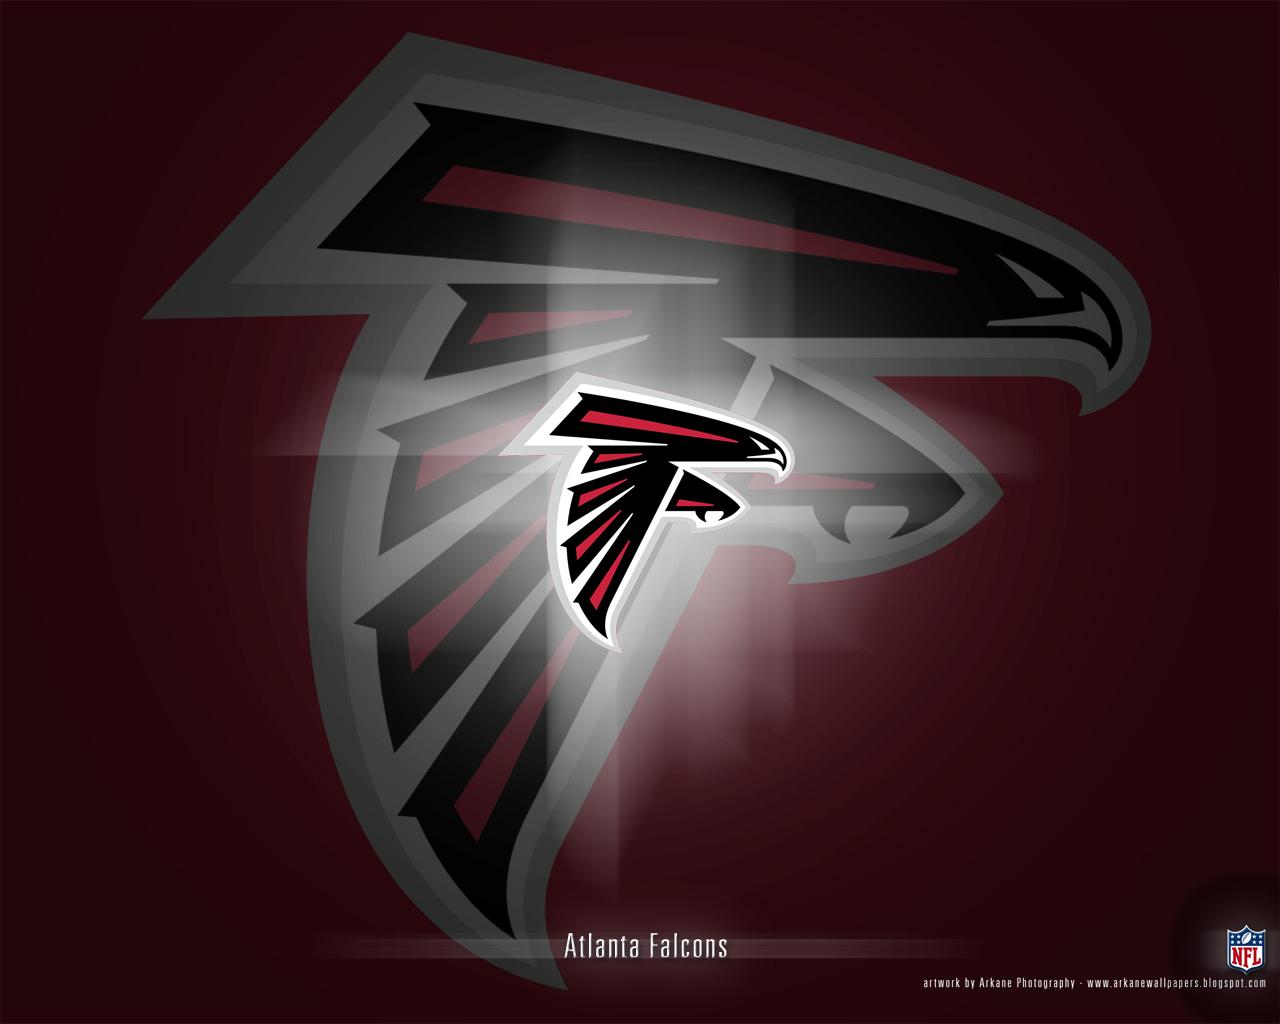 Atlanta Falcons Hd Wallpapers: Falcons IPhone Wallpaper